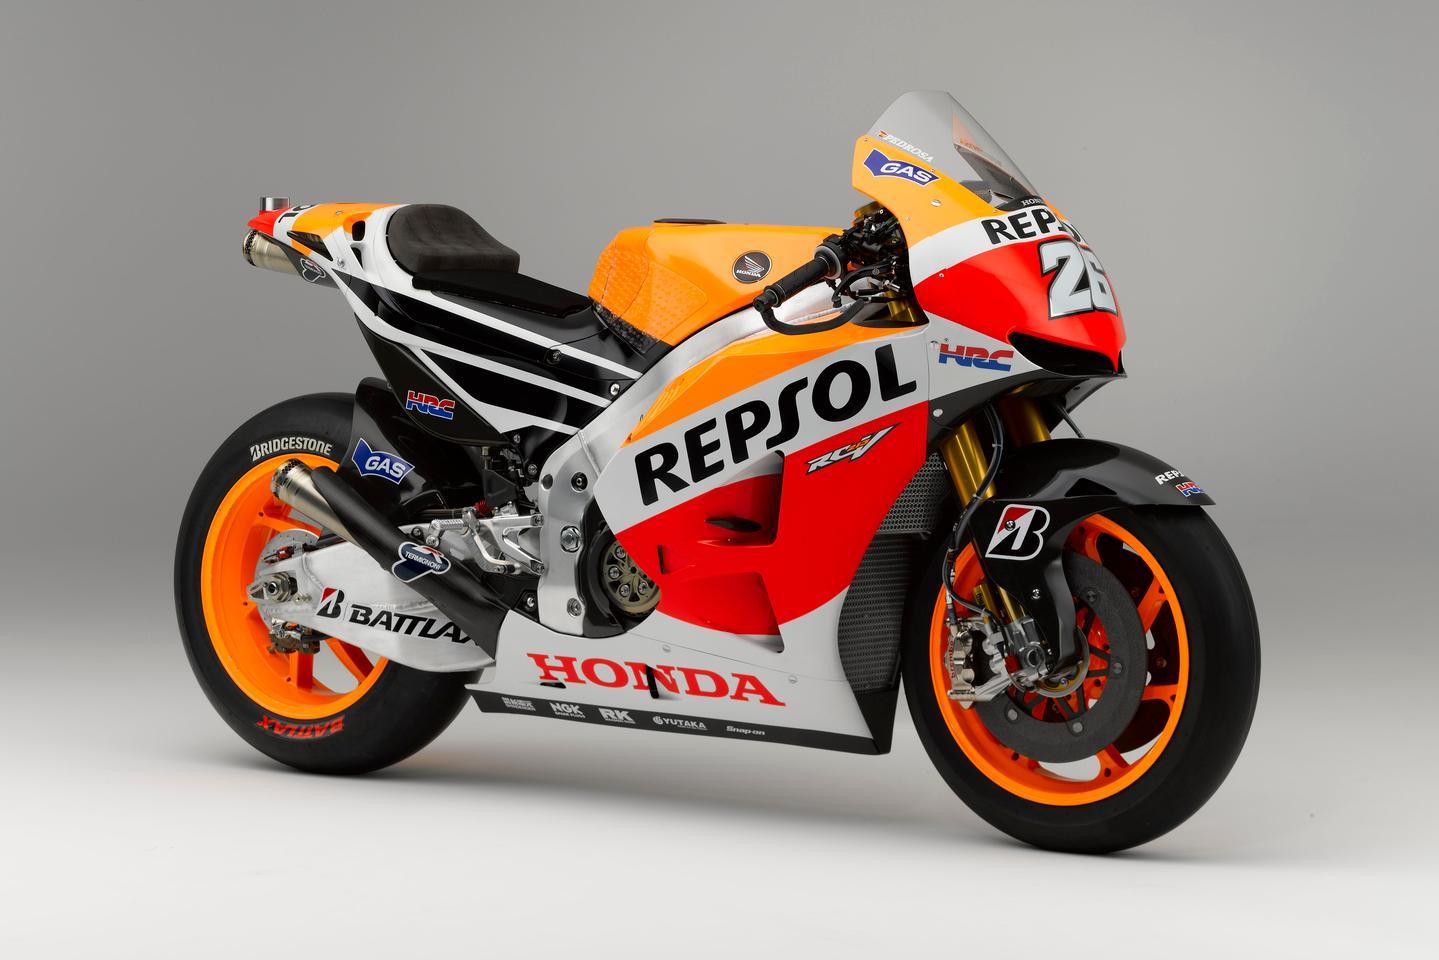 Honda's 2013 RC213V, the basis for the new production MotoGP bike